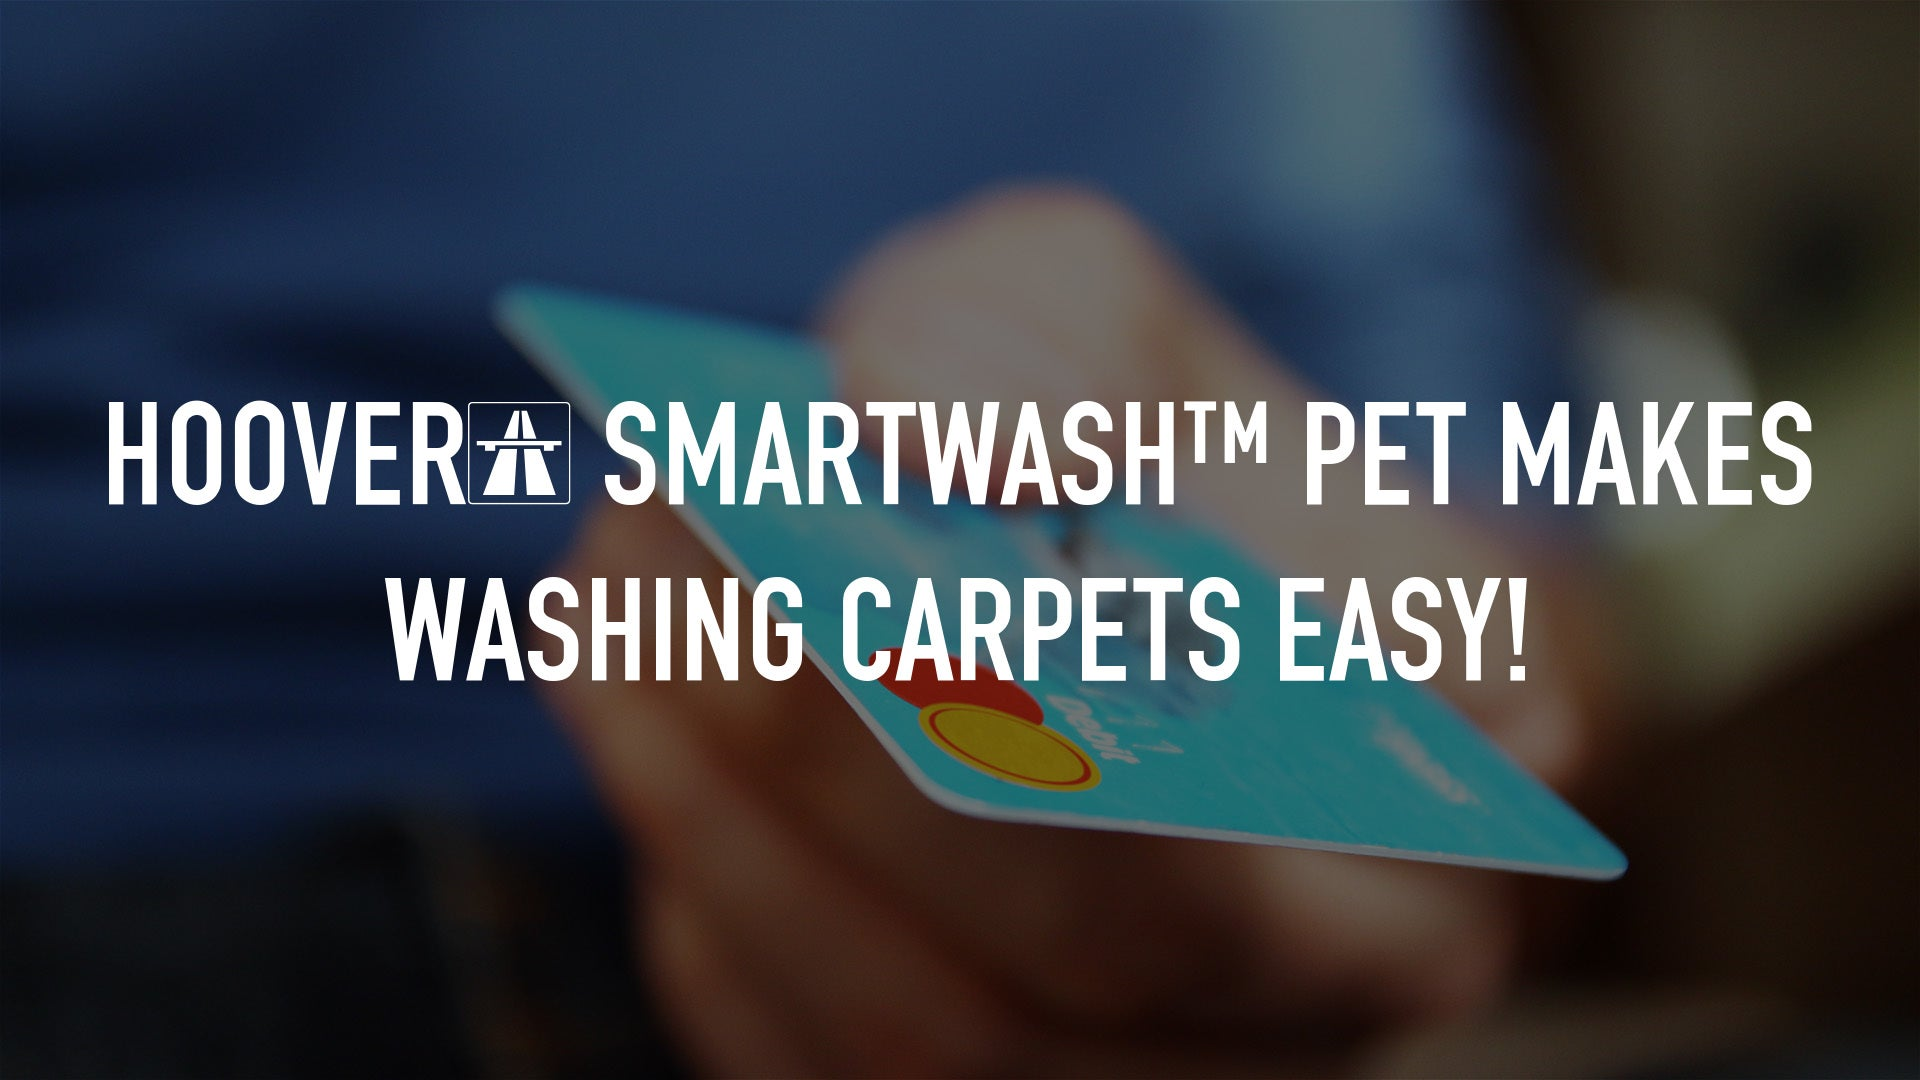 Hoover® SmartWash™ PET Makes Washing Carpets Easy!